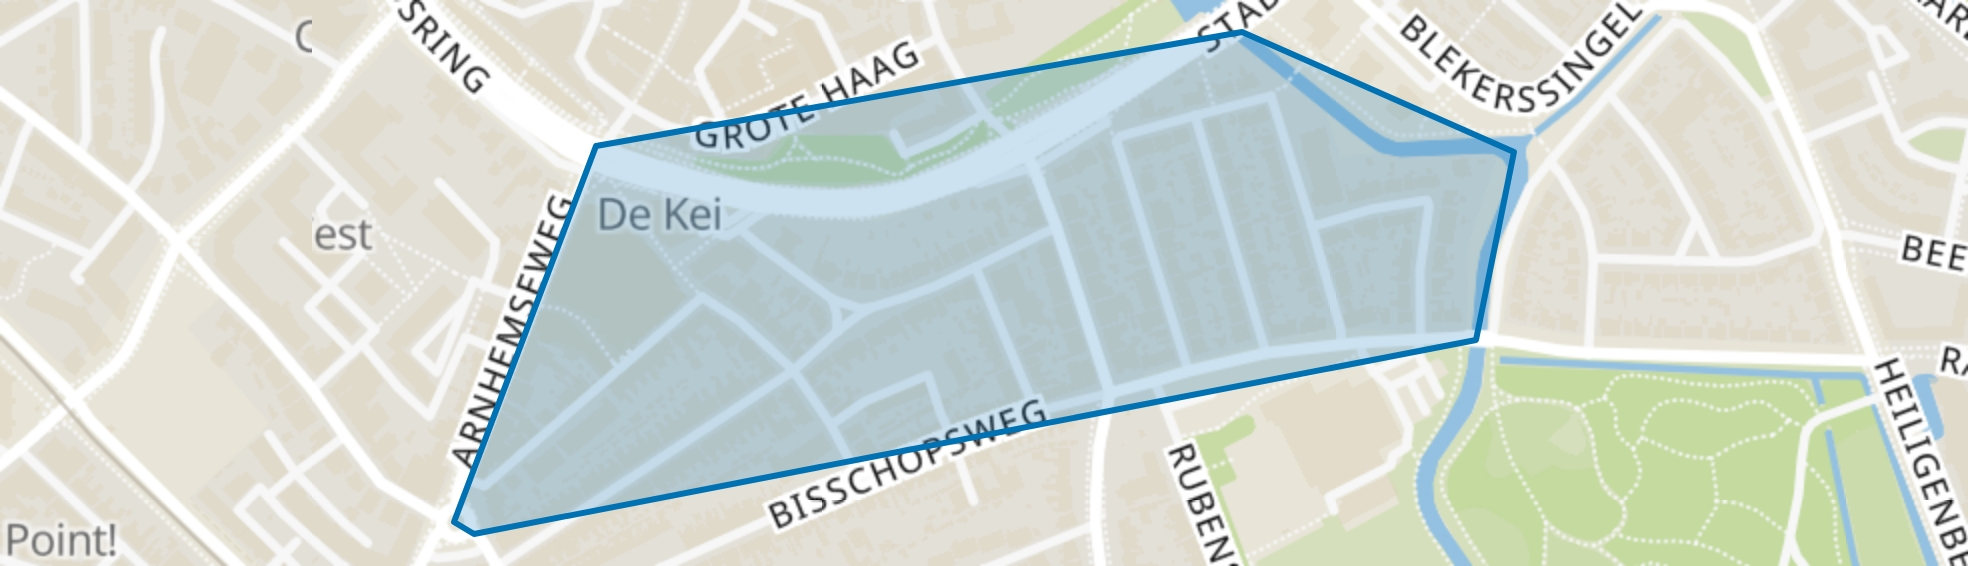 Bekenstein en De Luiaard, Amersfoort map